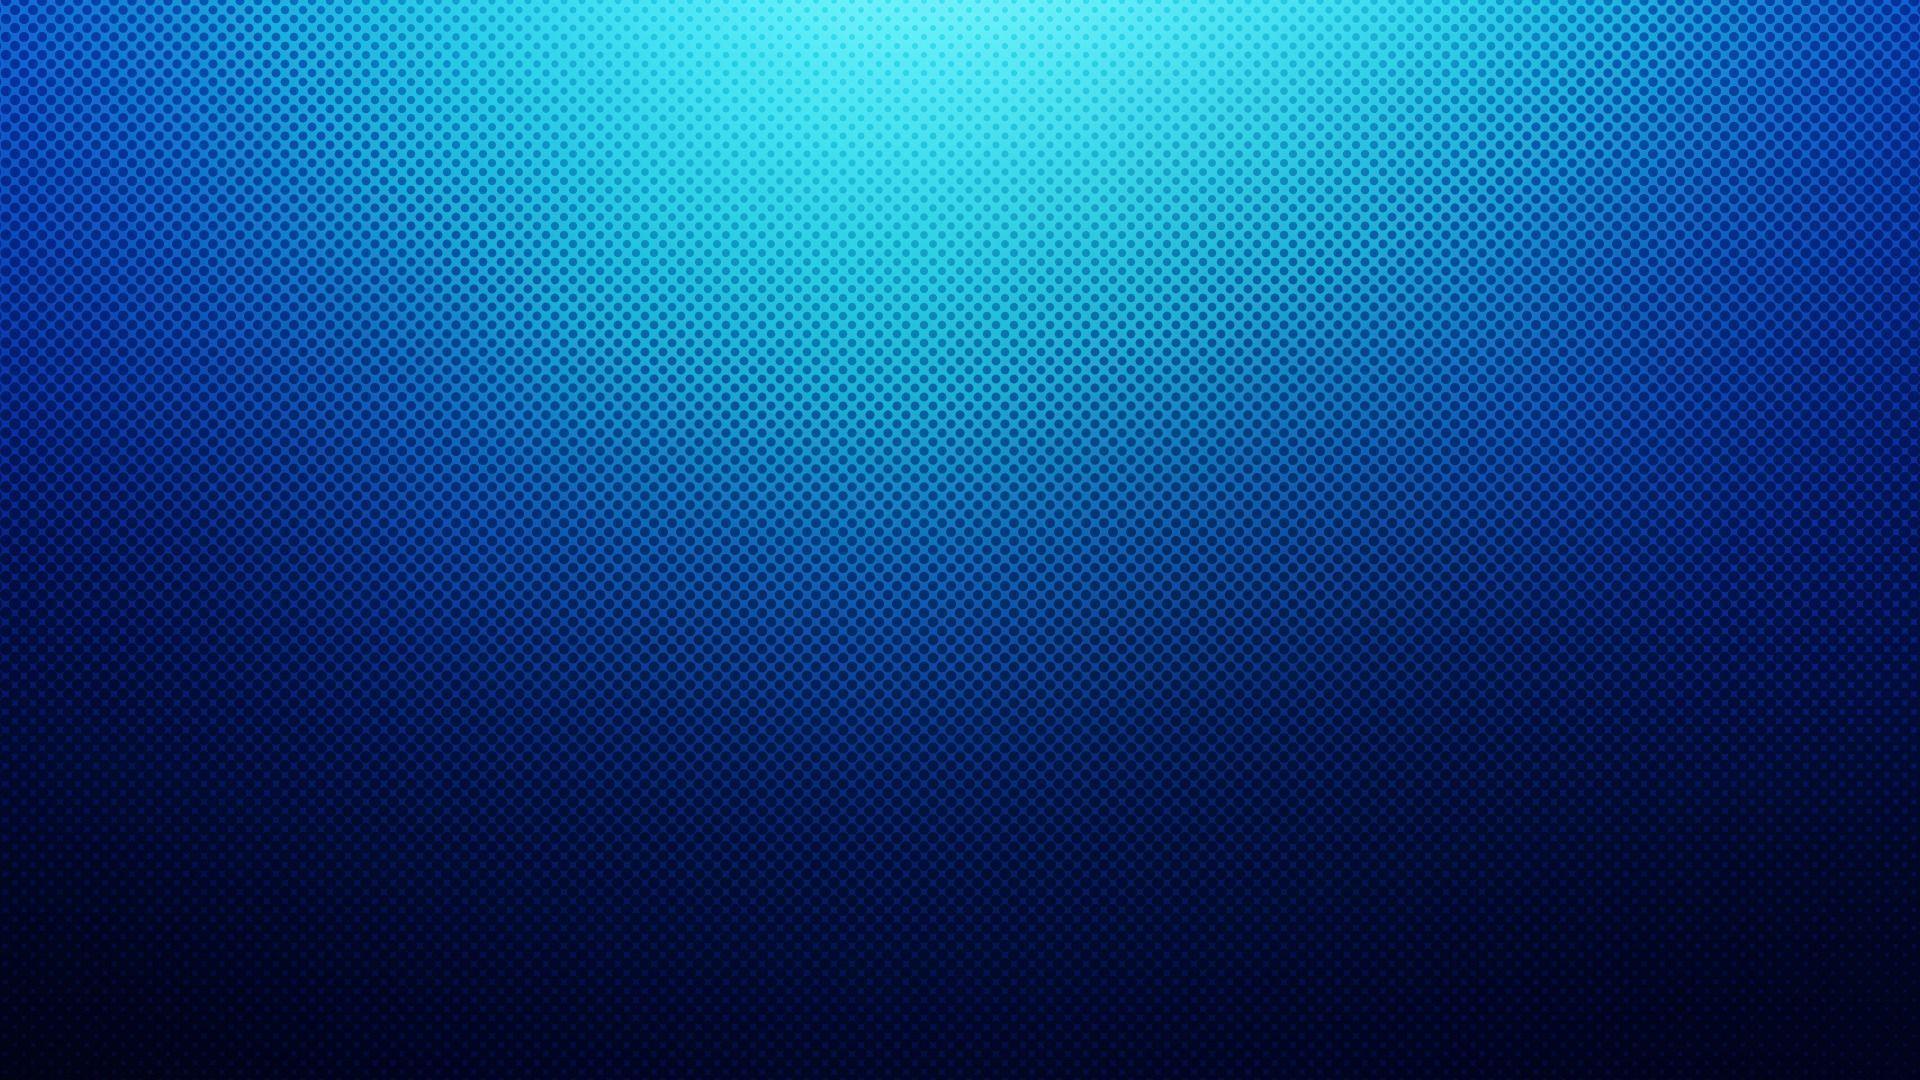 Blue Gradient Wallpapers Wallpaper Cave